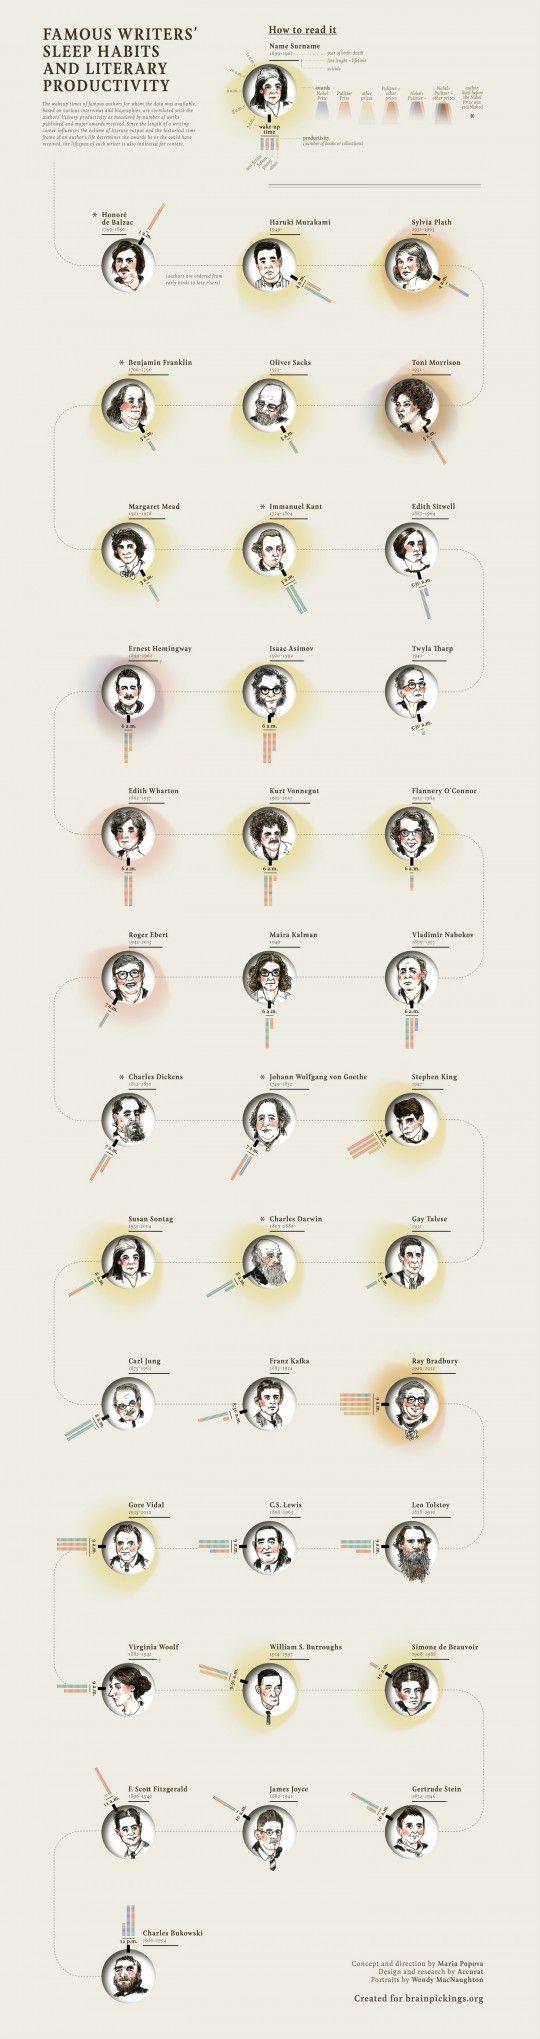 White apron sergio vodanovic english - Literary Productivity And Sleep Habits Of Famous Writers I M Between Franz Kafka